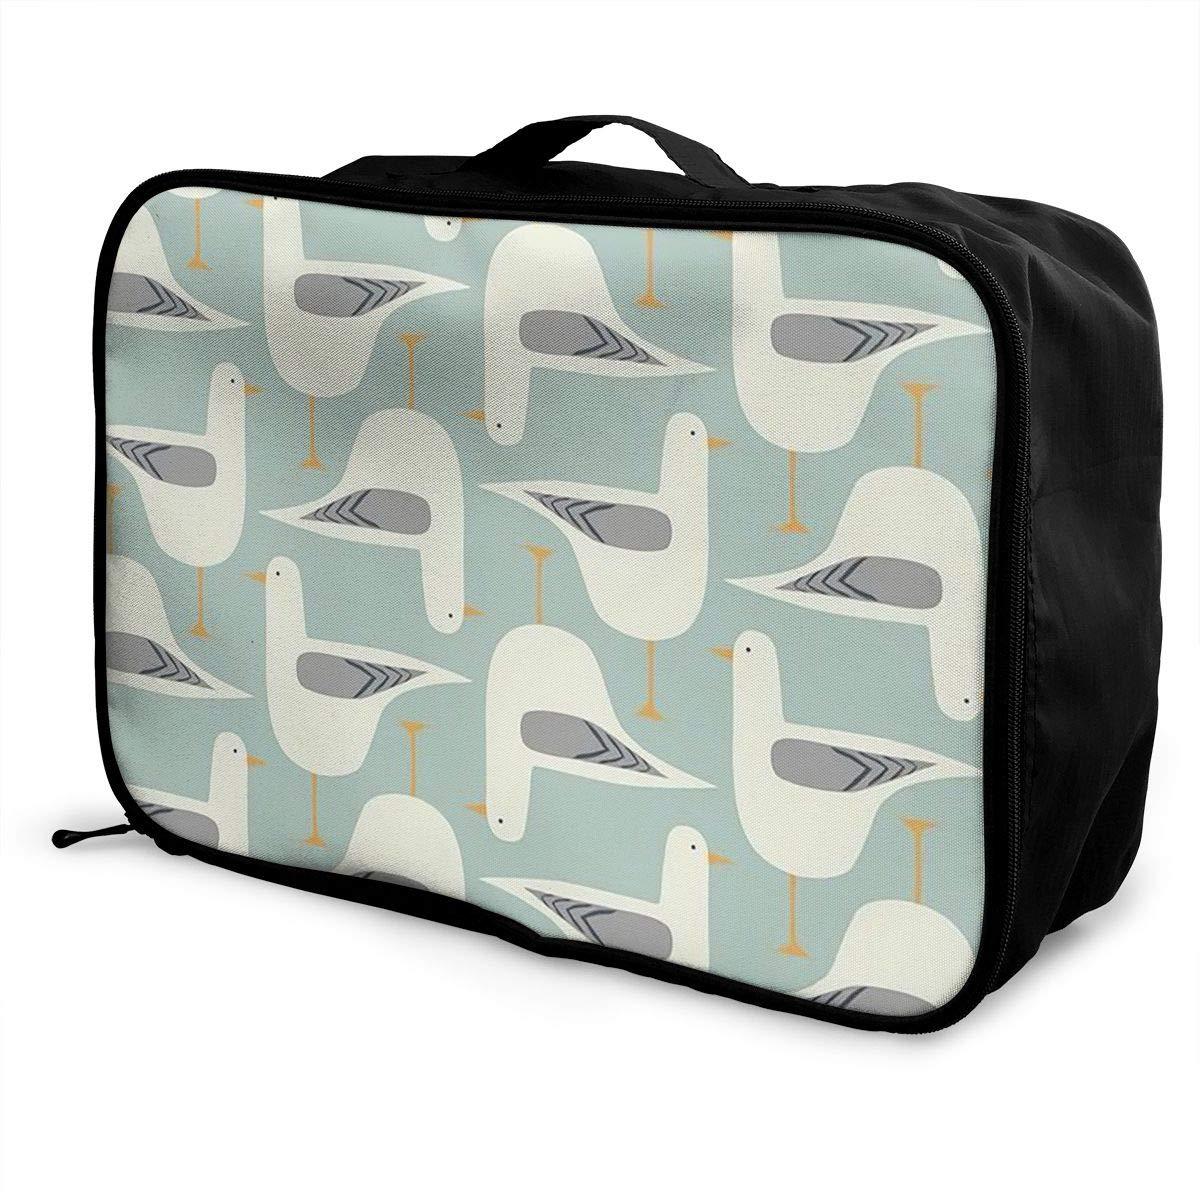 Travel Luggage Duffle Bag Lightweight Portable Handbag Bird Pattern Large Capacity Waterproof Foldable Storage Tote